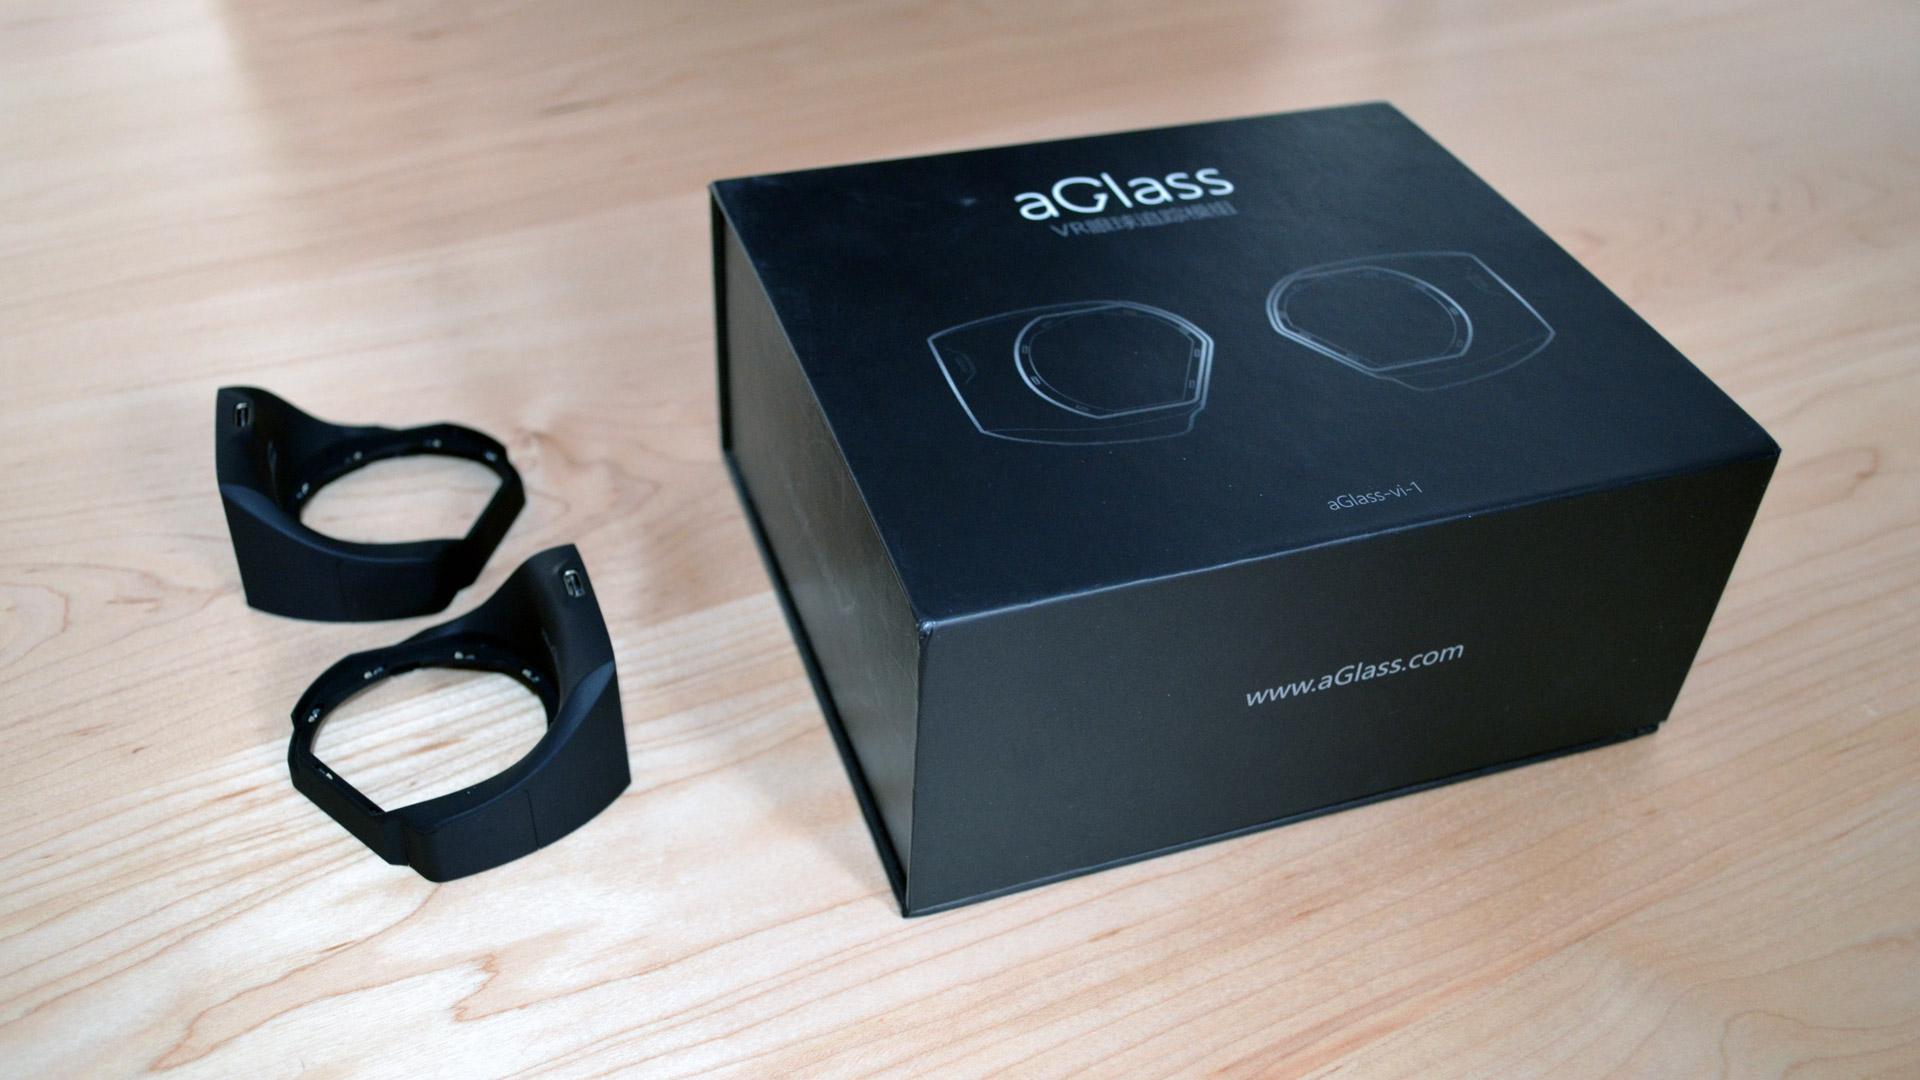 htc vive aglass tracking des yeux et lentilles correctrices. Black Bedroom Furniture Sets. Home Design Ideas